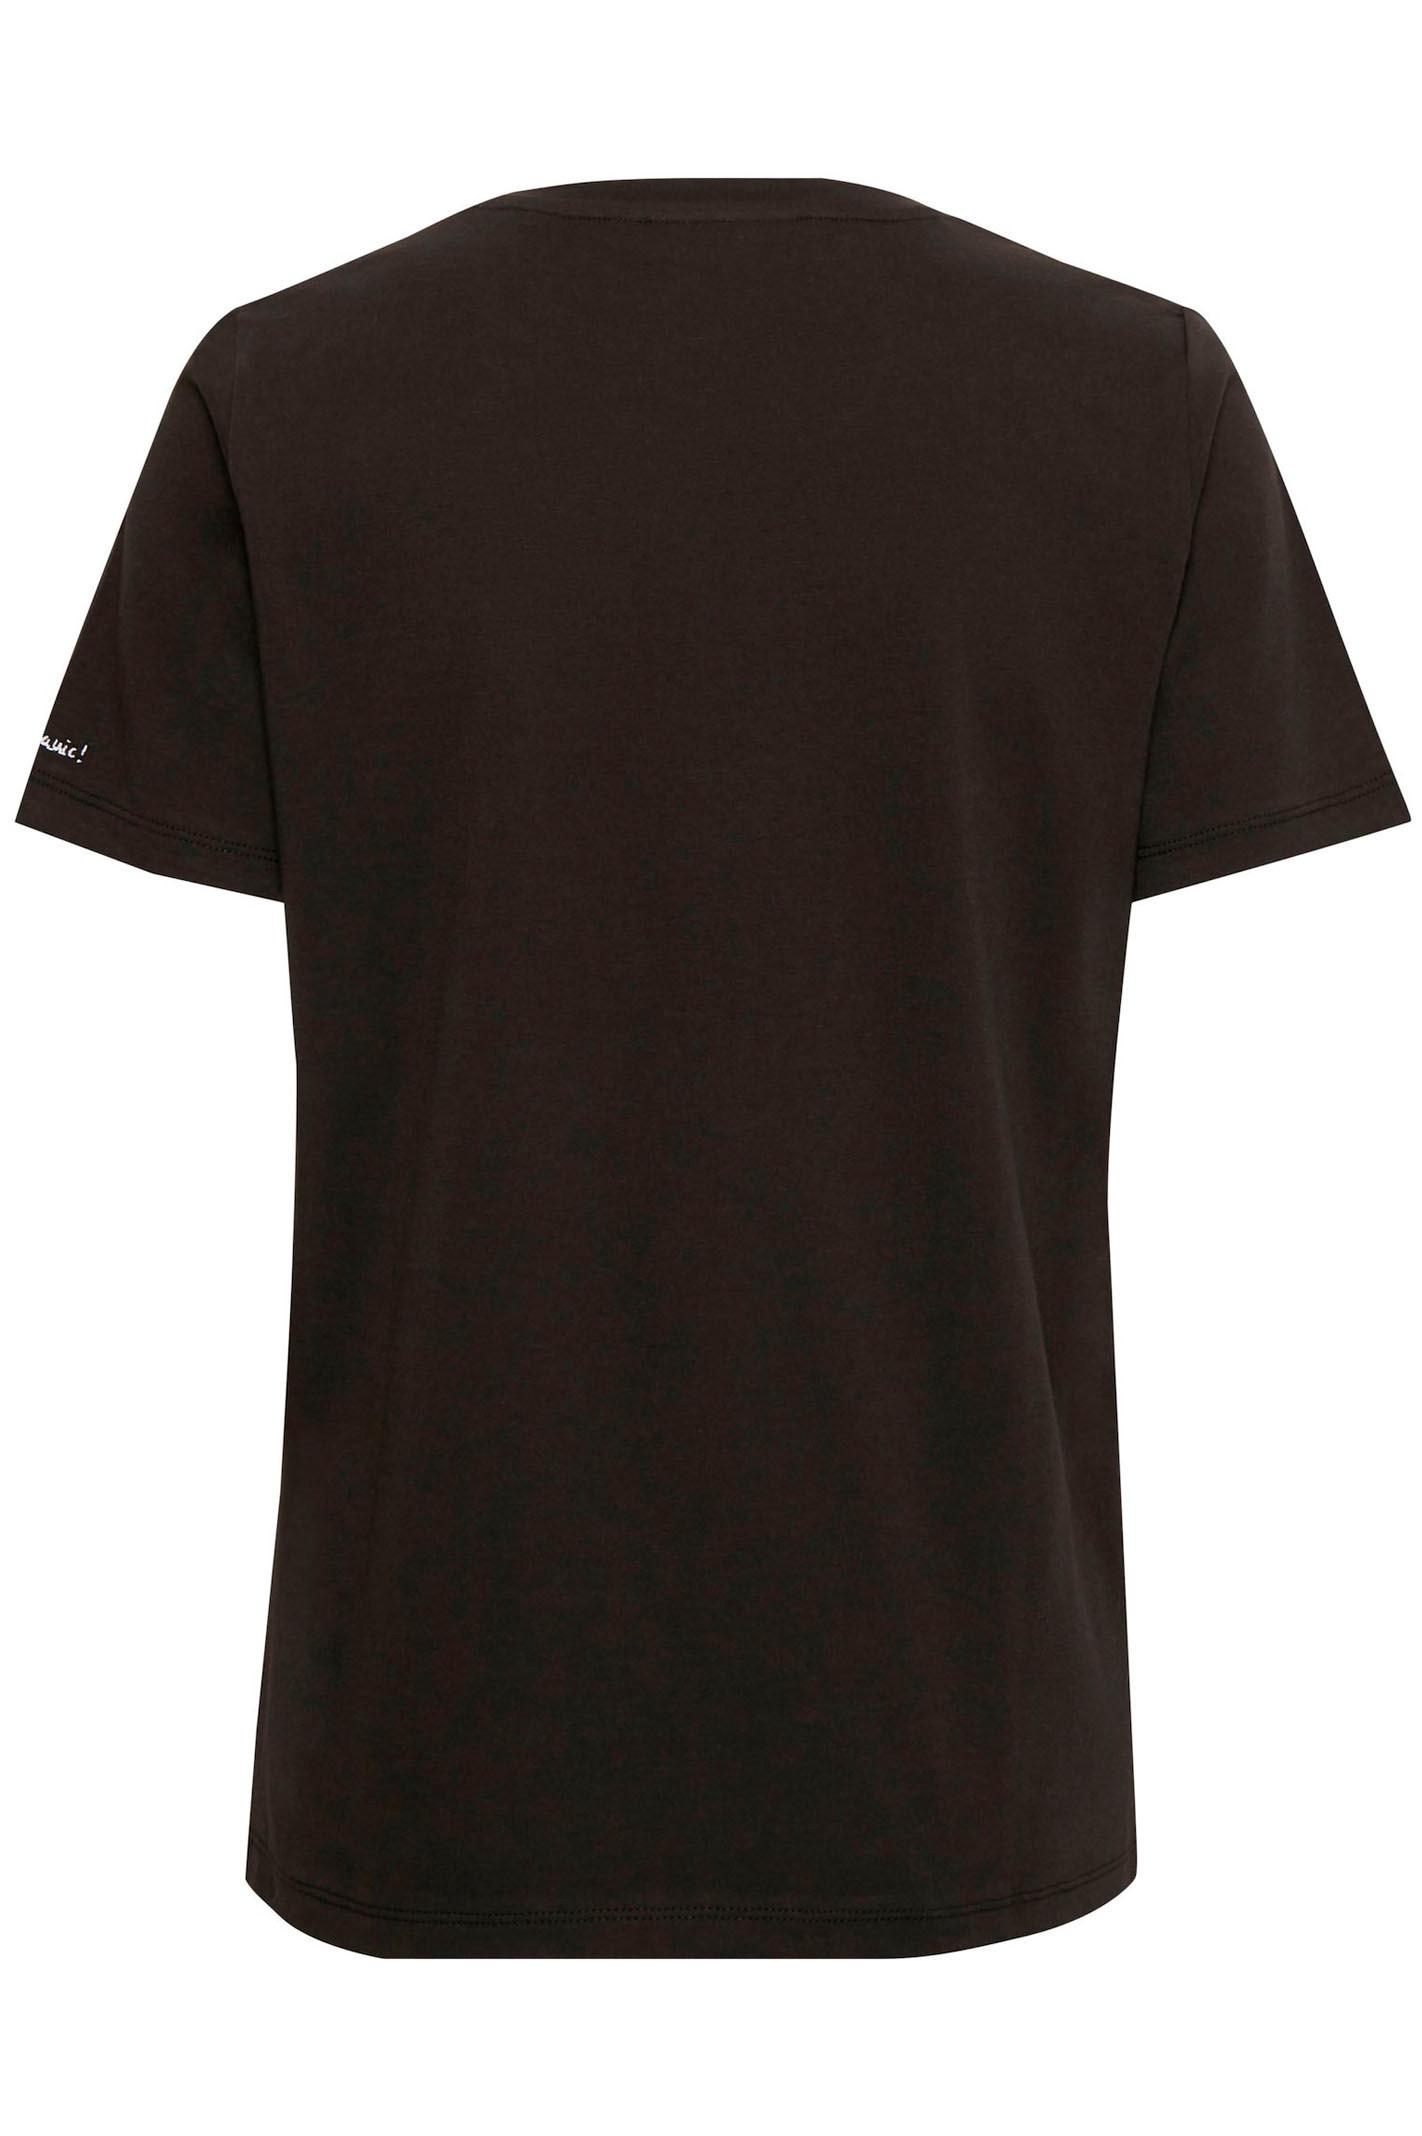 InWear Top Kaila O-neck T-shirt - Sort - Toppe